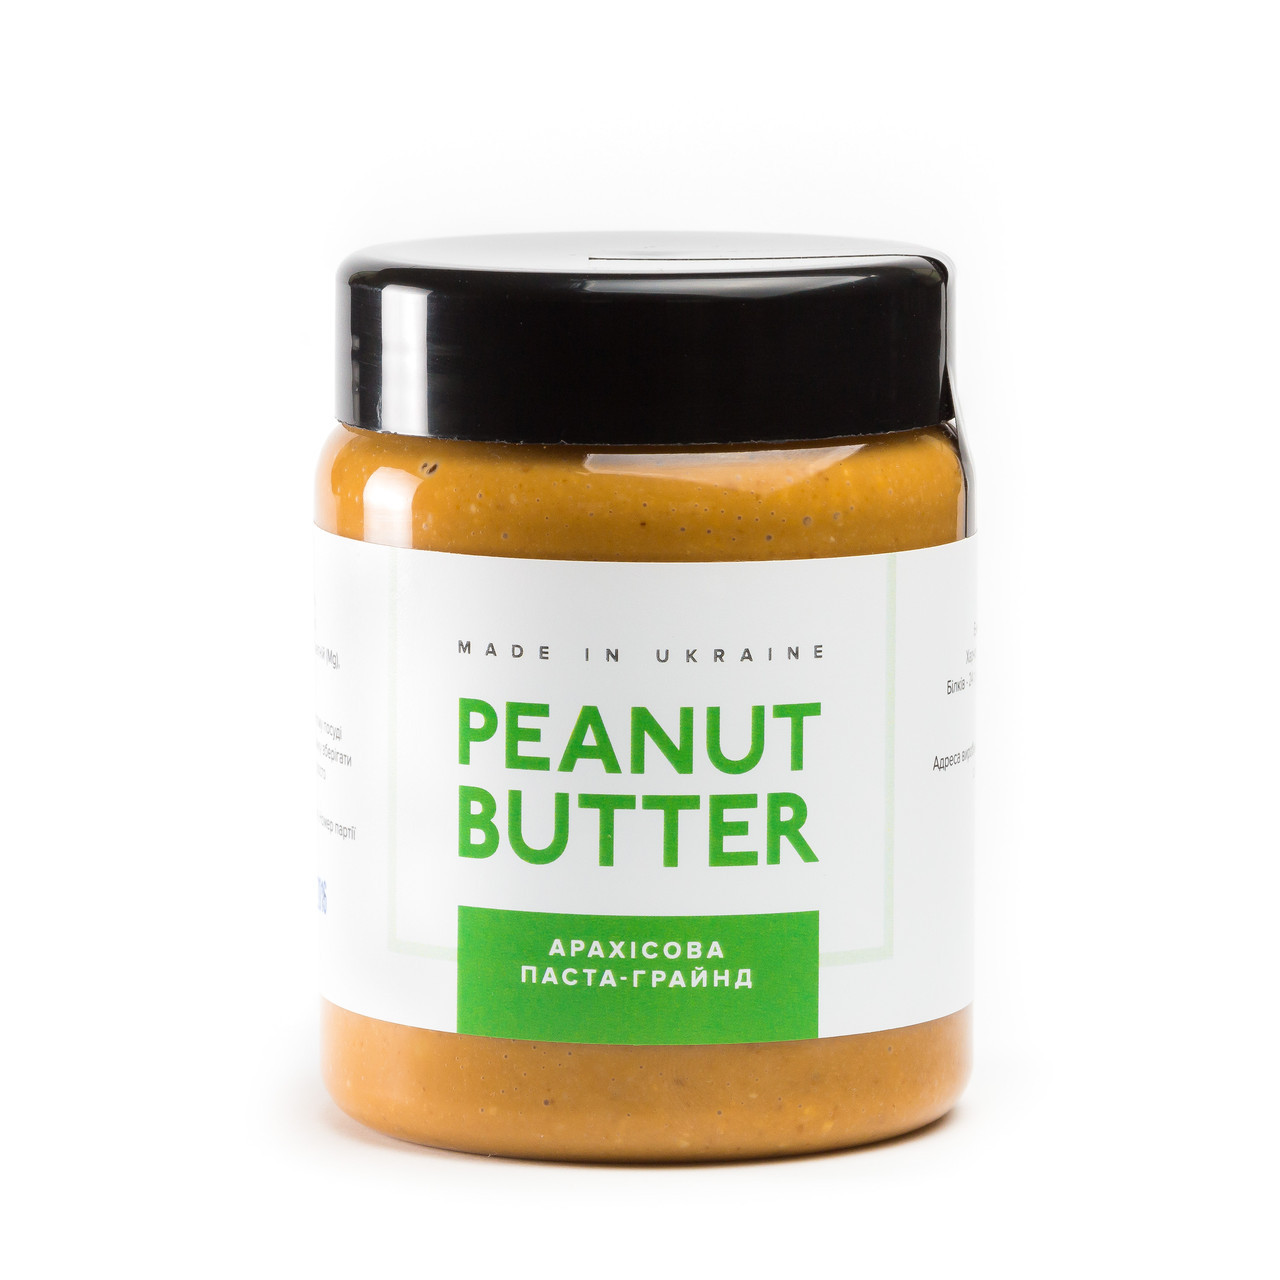 Арахисовая паста Грайнд Peanut Butter  400 г